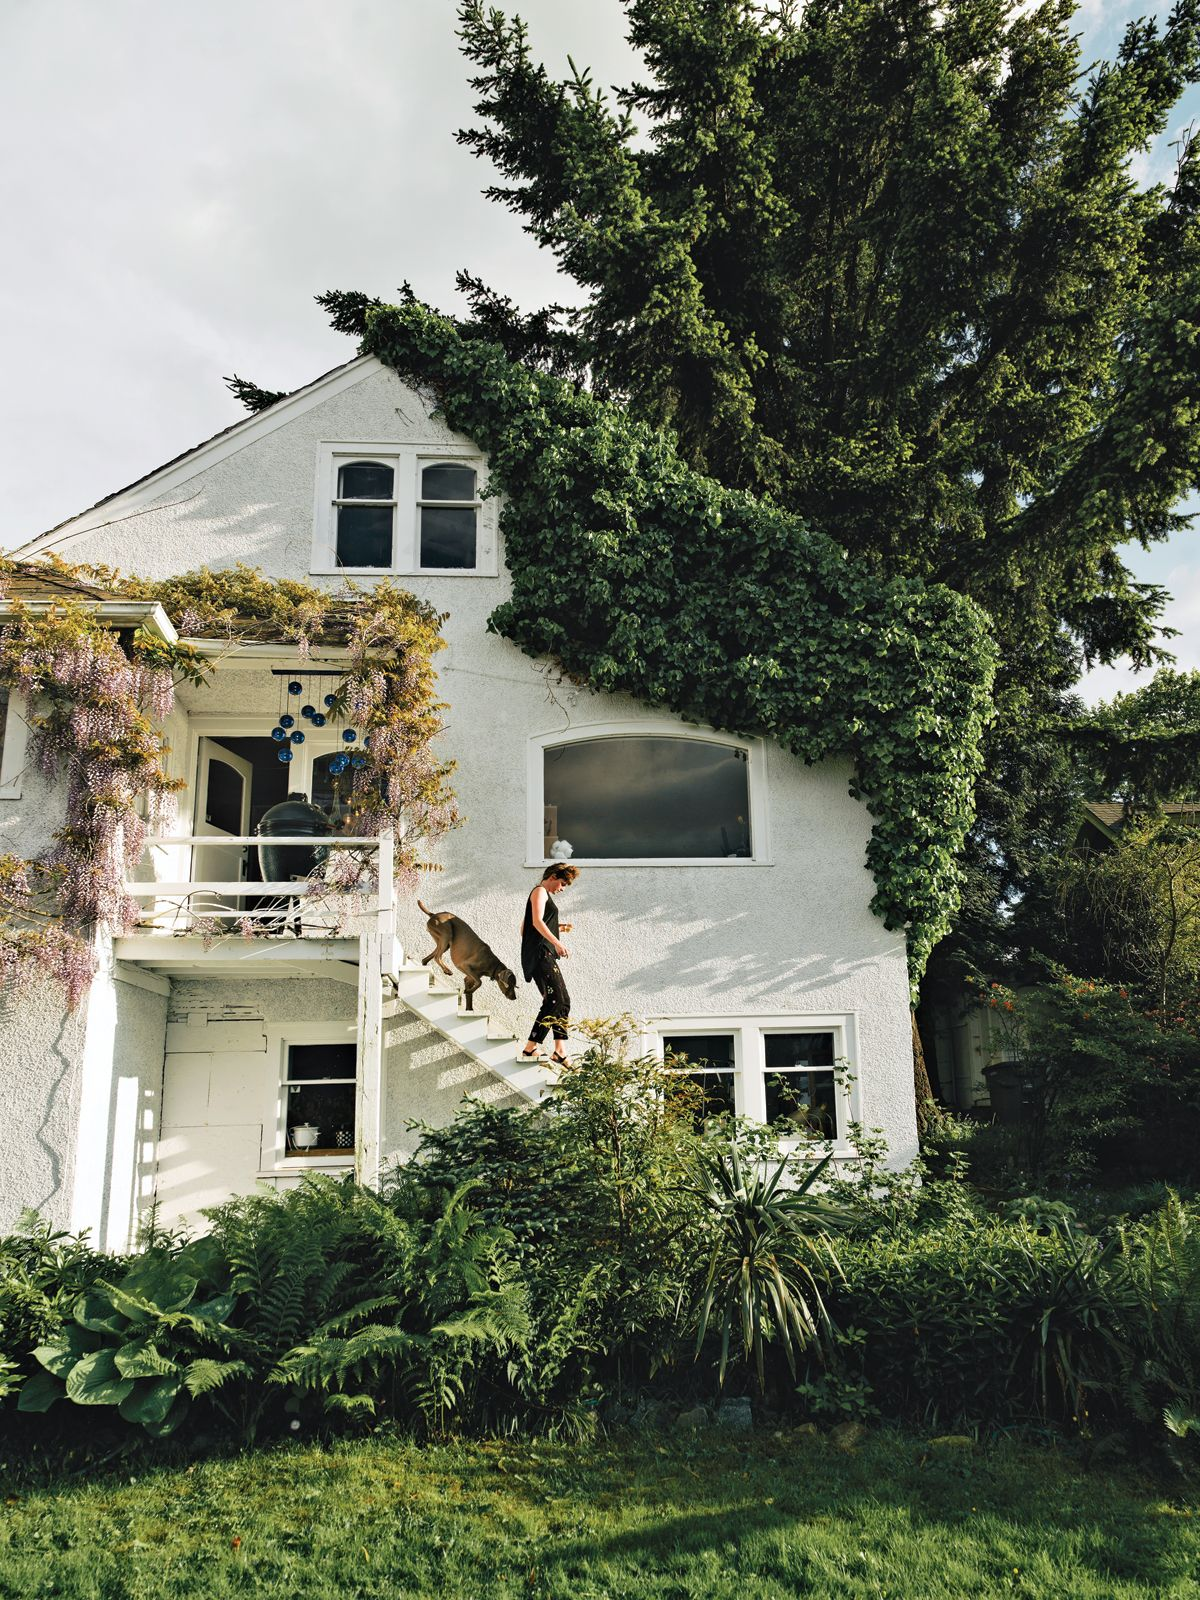 White stucco home exterior - Small second story porch - Lush green garden -  Wisteria -